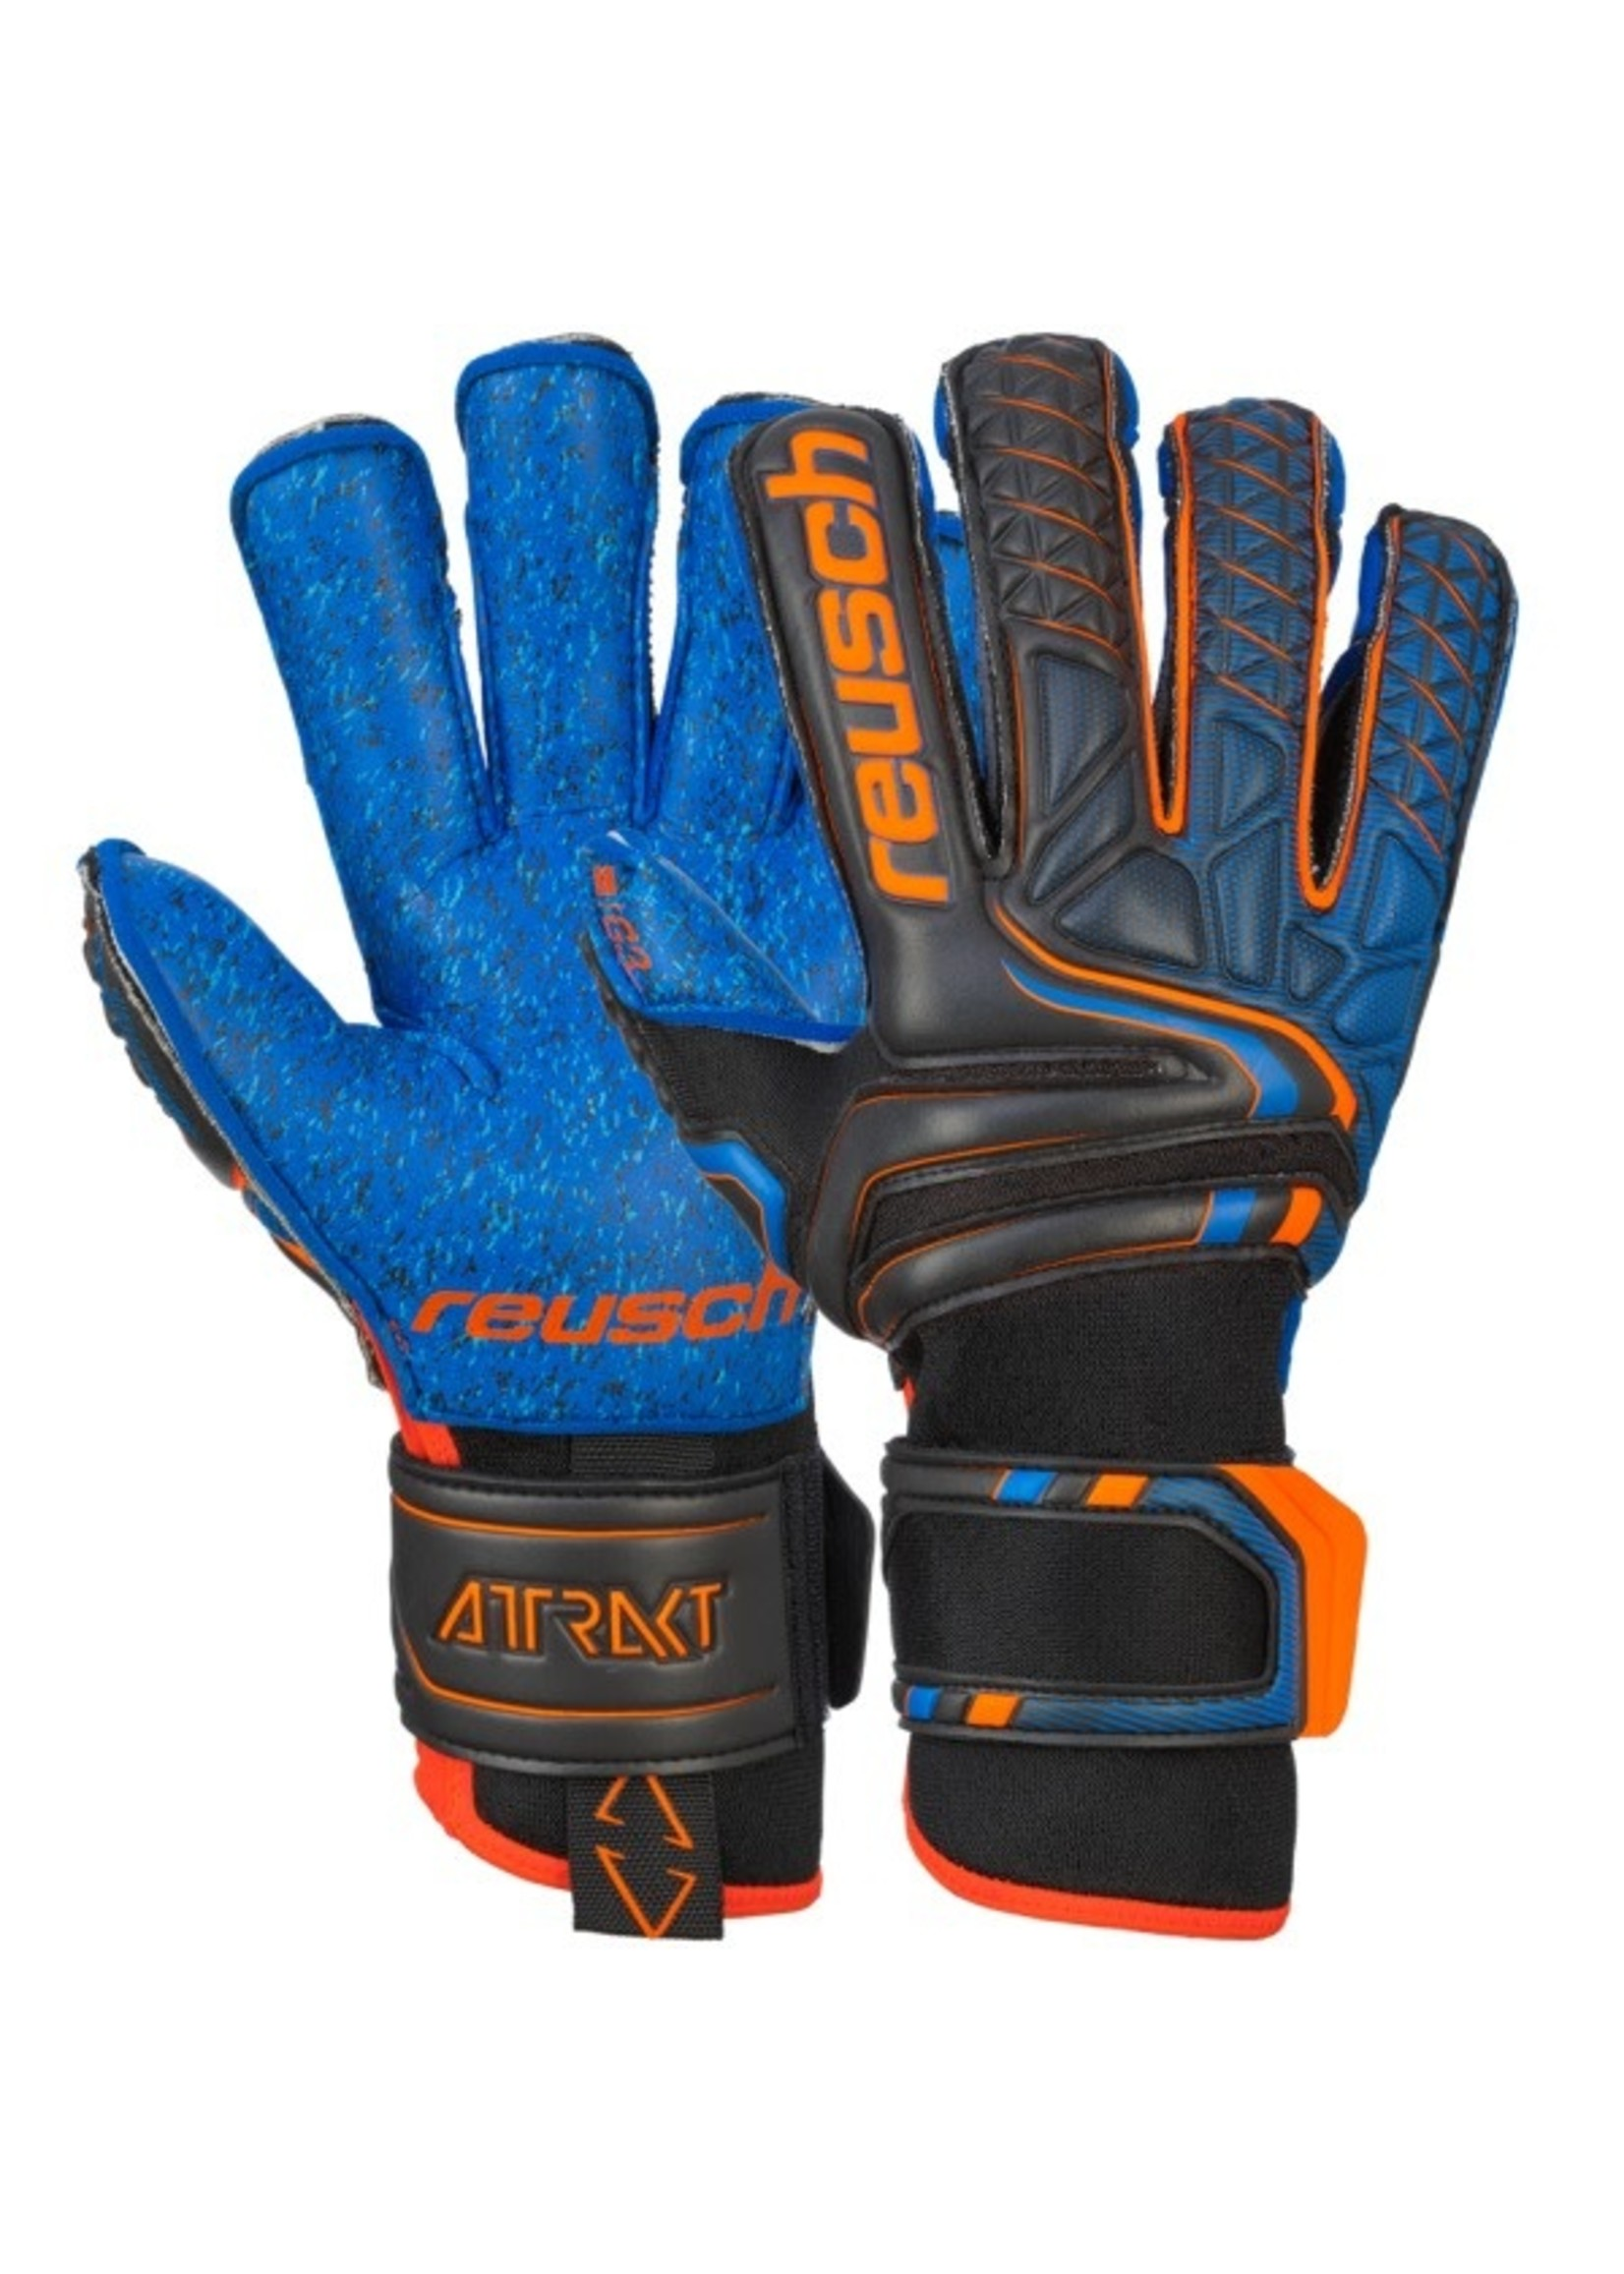 Reusch Attrakt G3 Fusion Evolution Finger Support